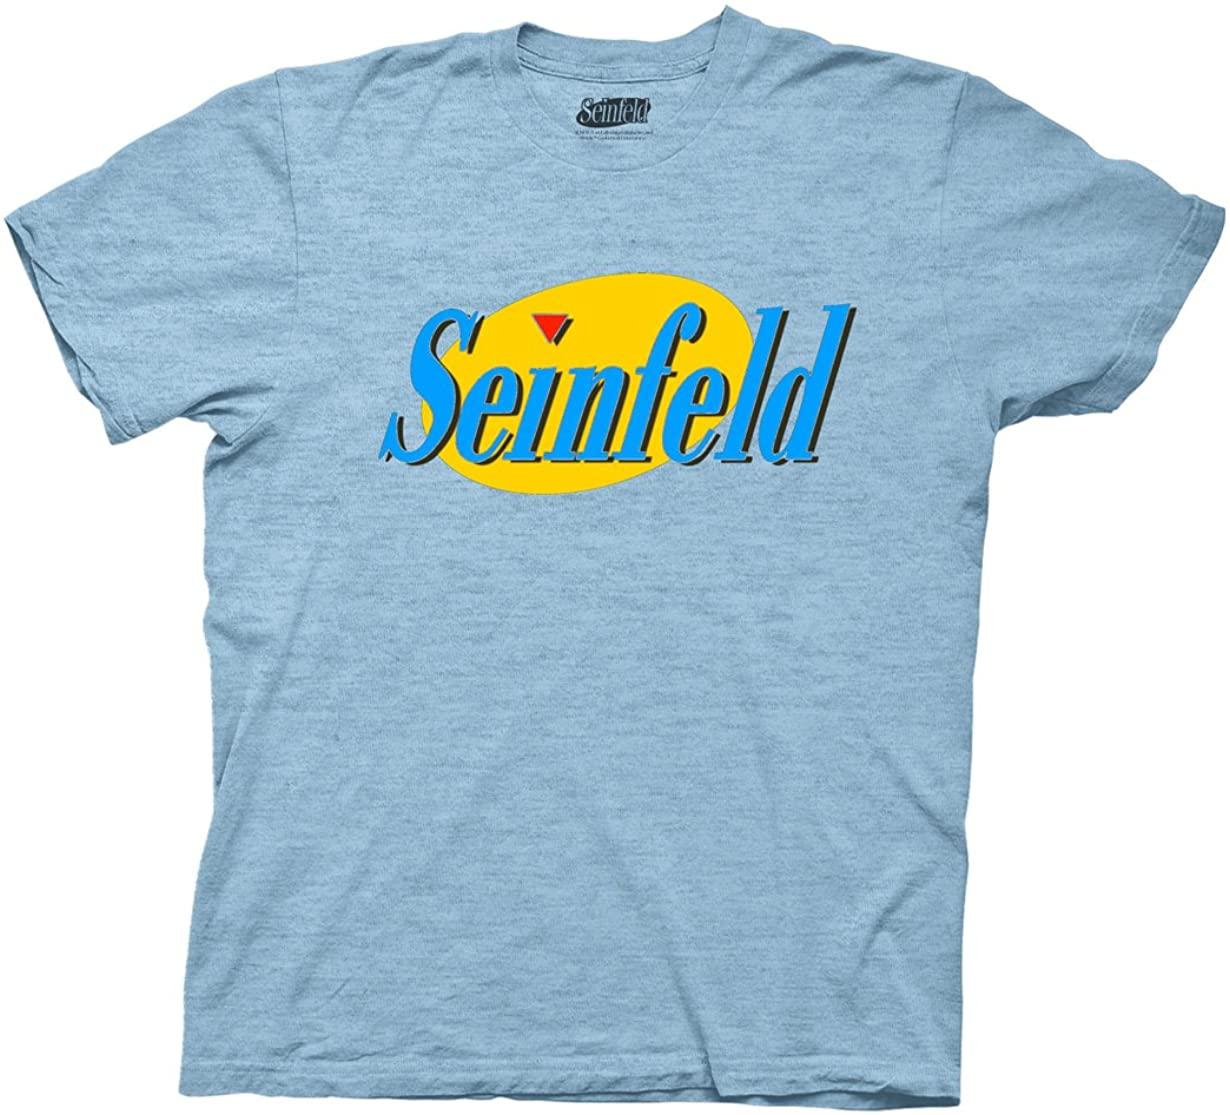 Ripple Junction Seinfeld Season 3 Color Logo Adult T-Shirt